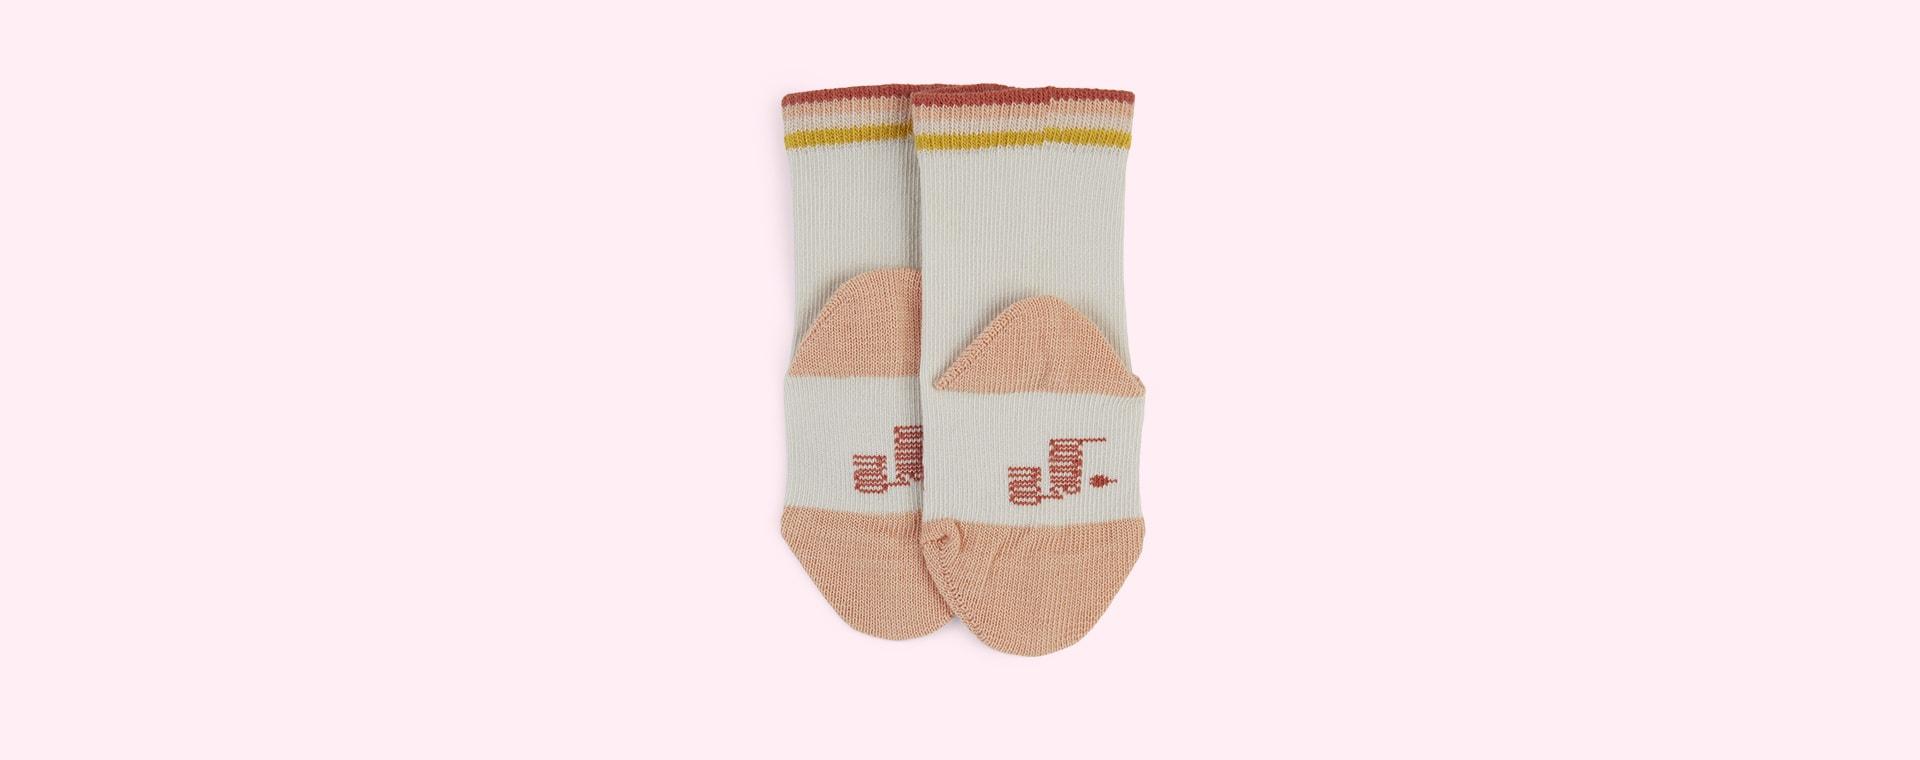 Peach The Bonnie Mob Rainbow Socks